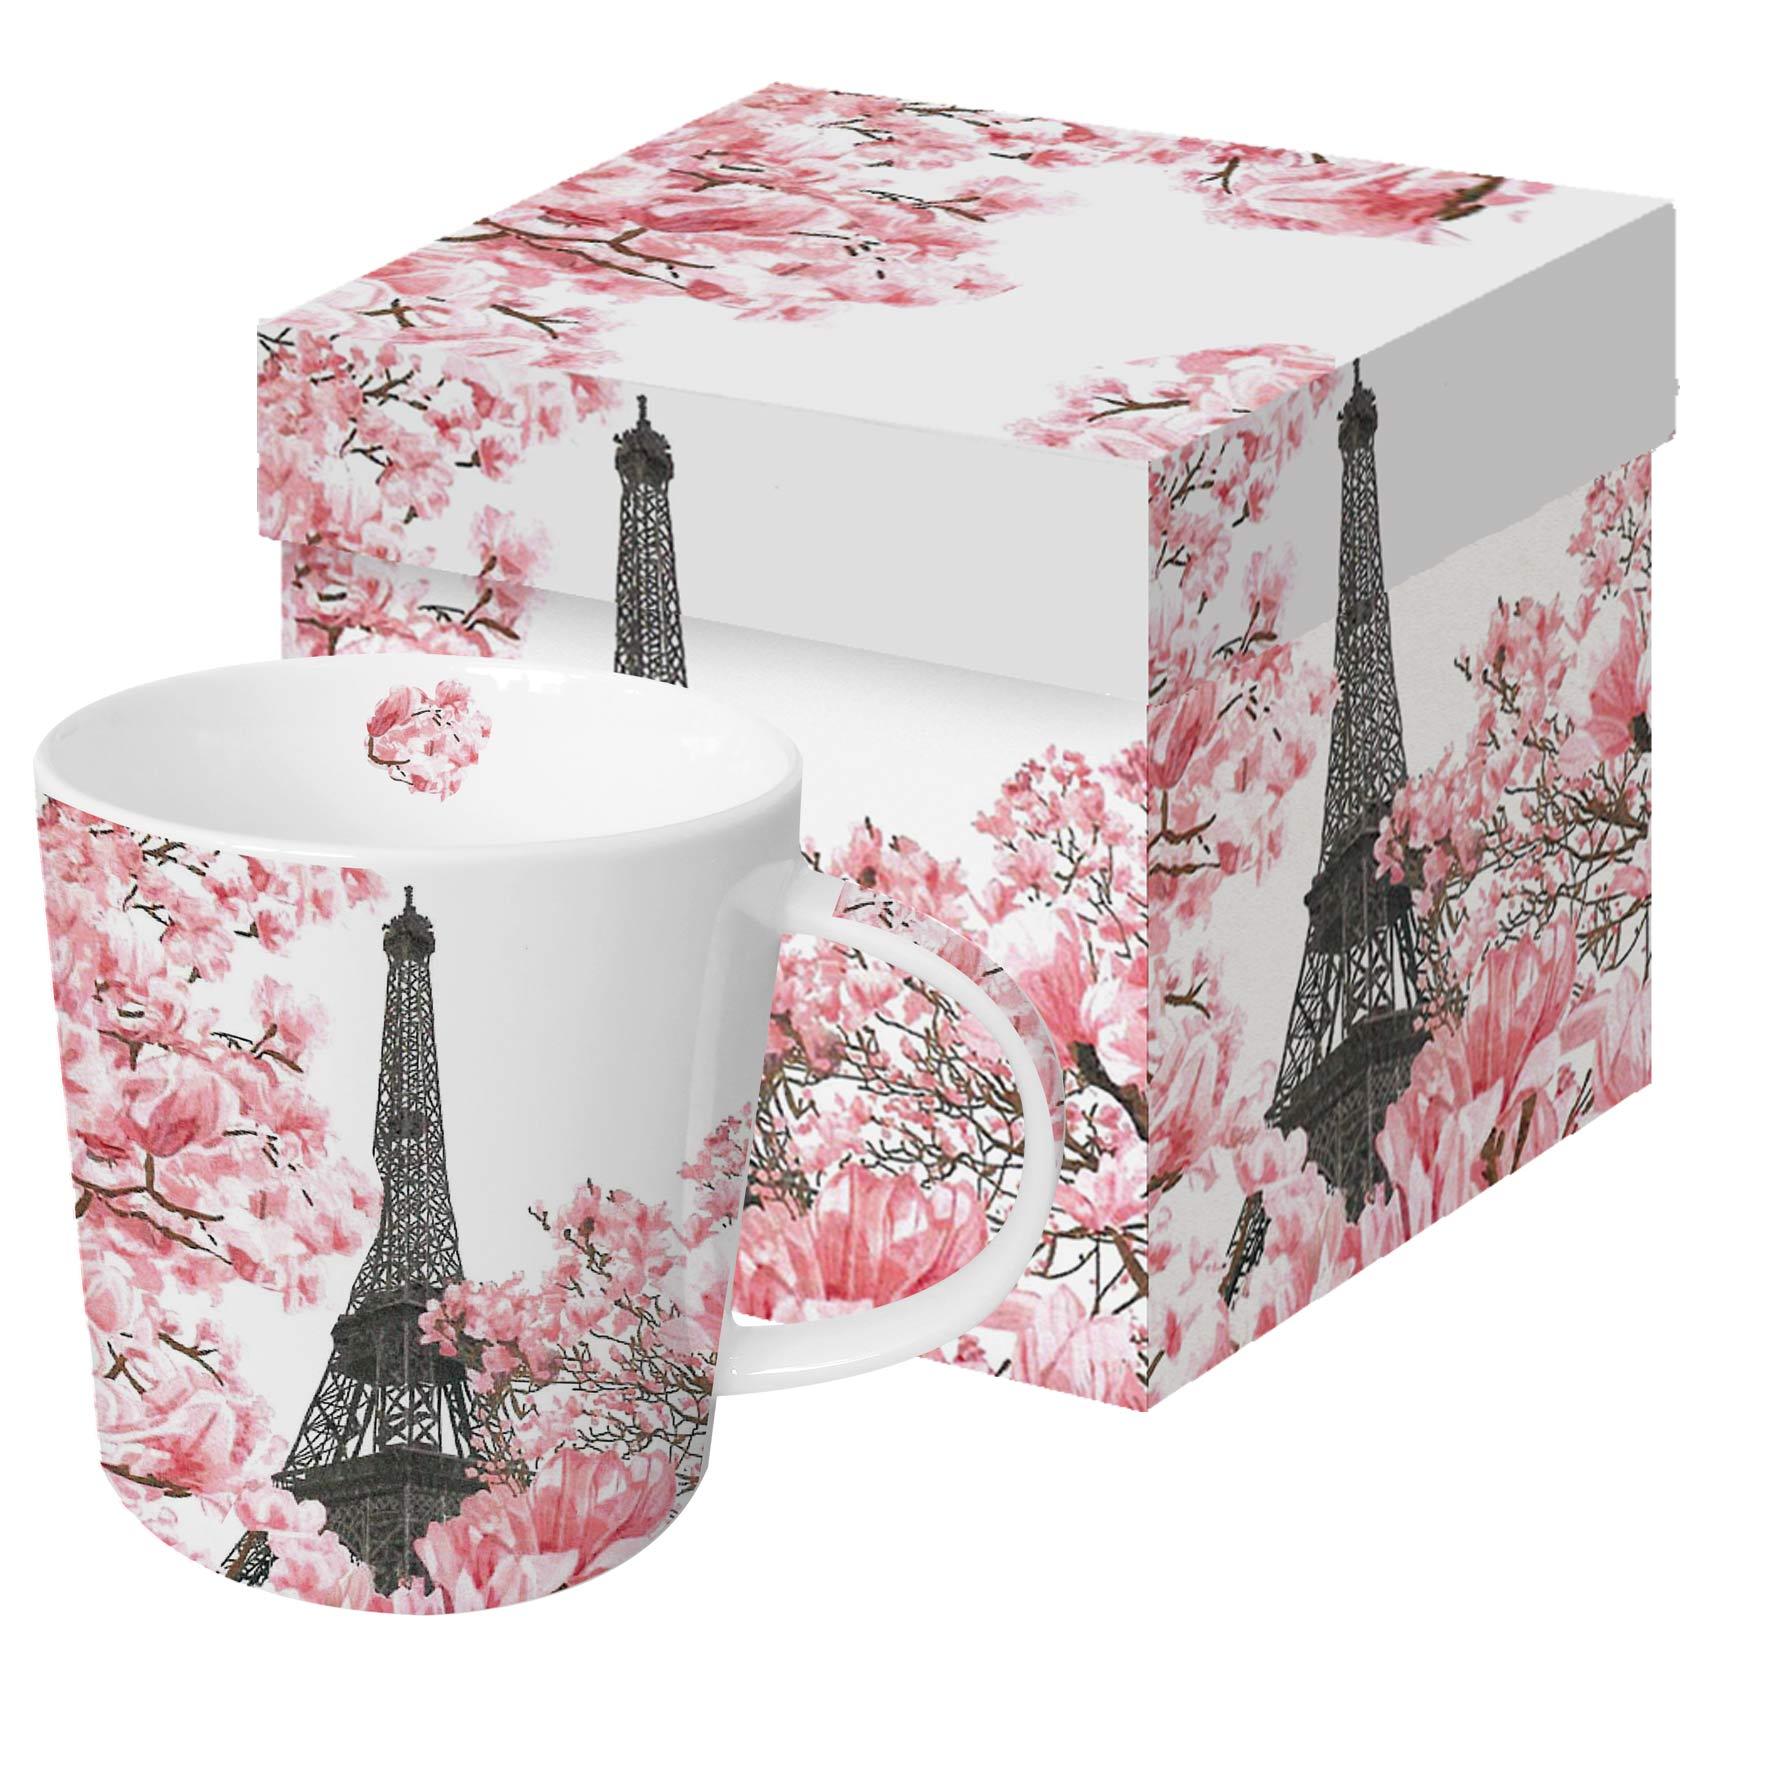 April in Paris Trend Mug GB